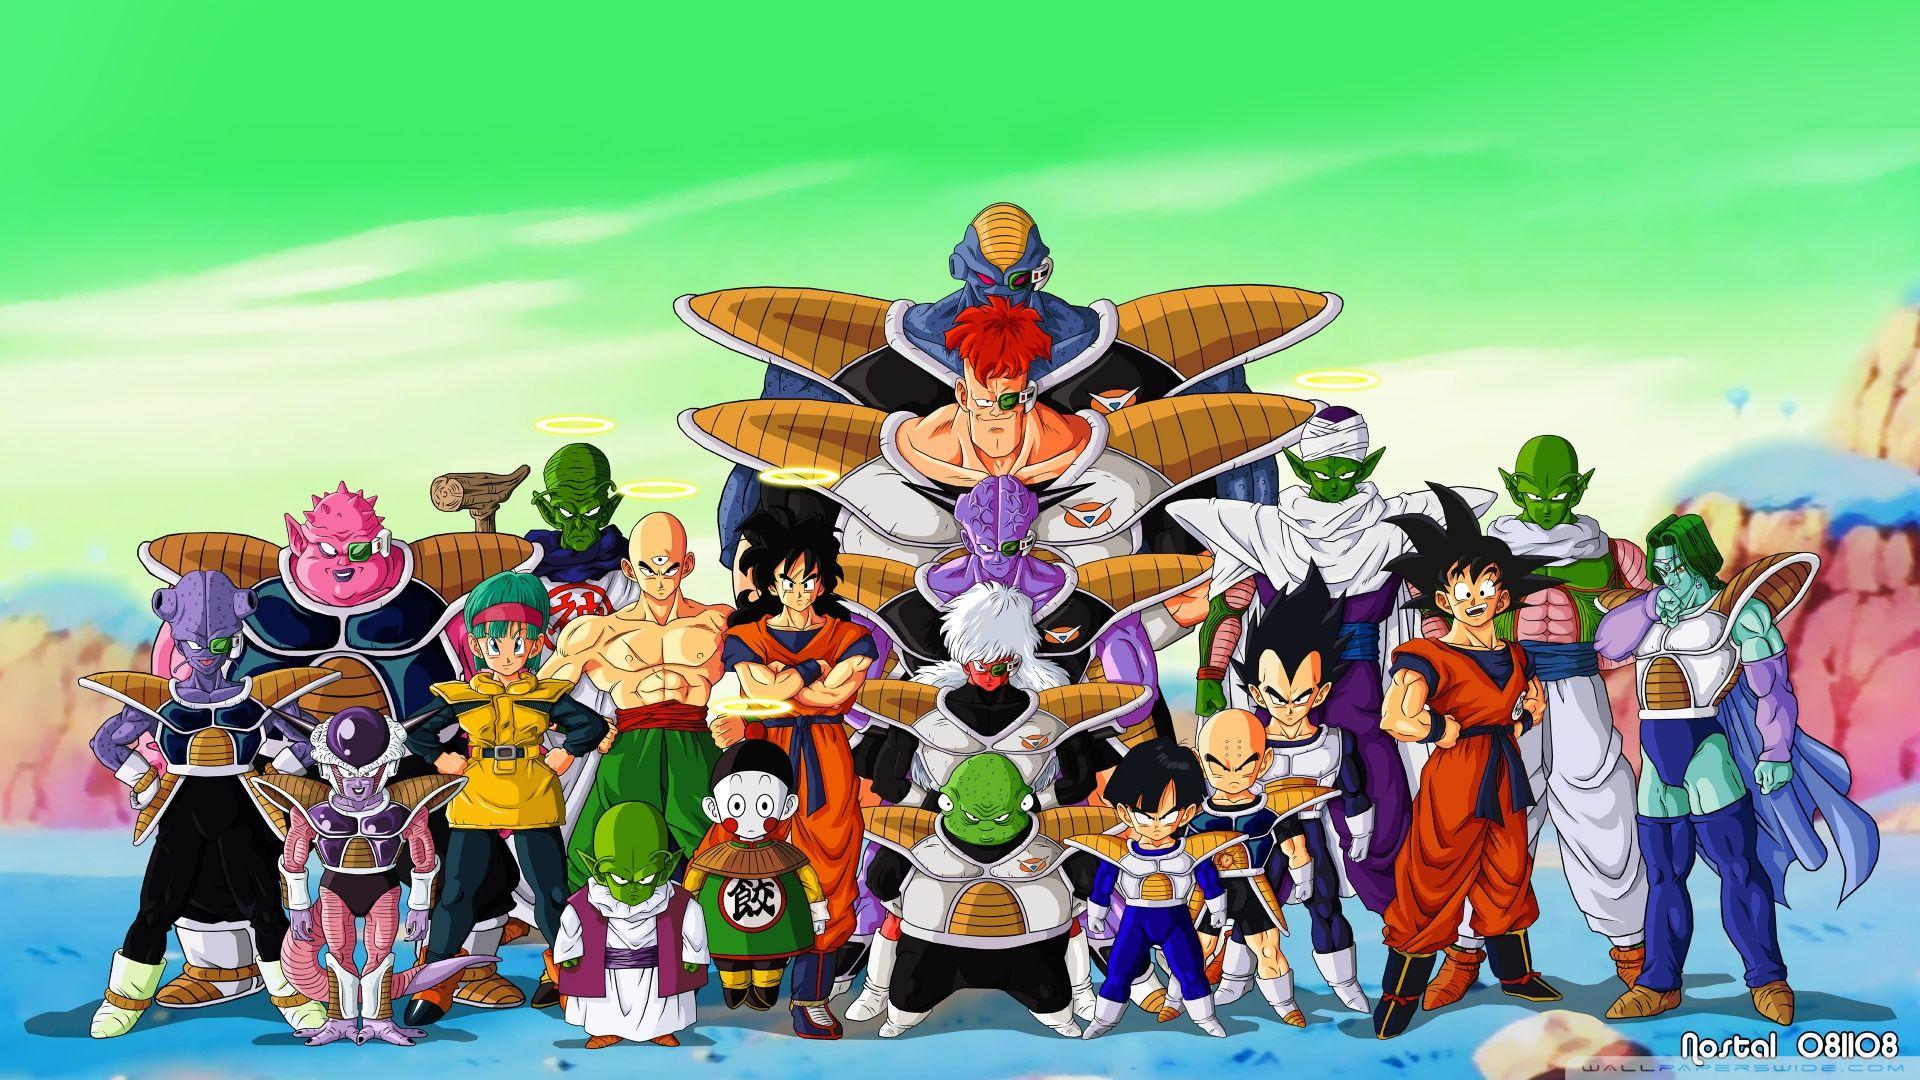 Saiyan Saga Dragon Ball Z Movies Shows Desktop Wallpapers Cartoon Dragon Ball Wallpapers Anime Dragon Ball Z Wallpaper